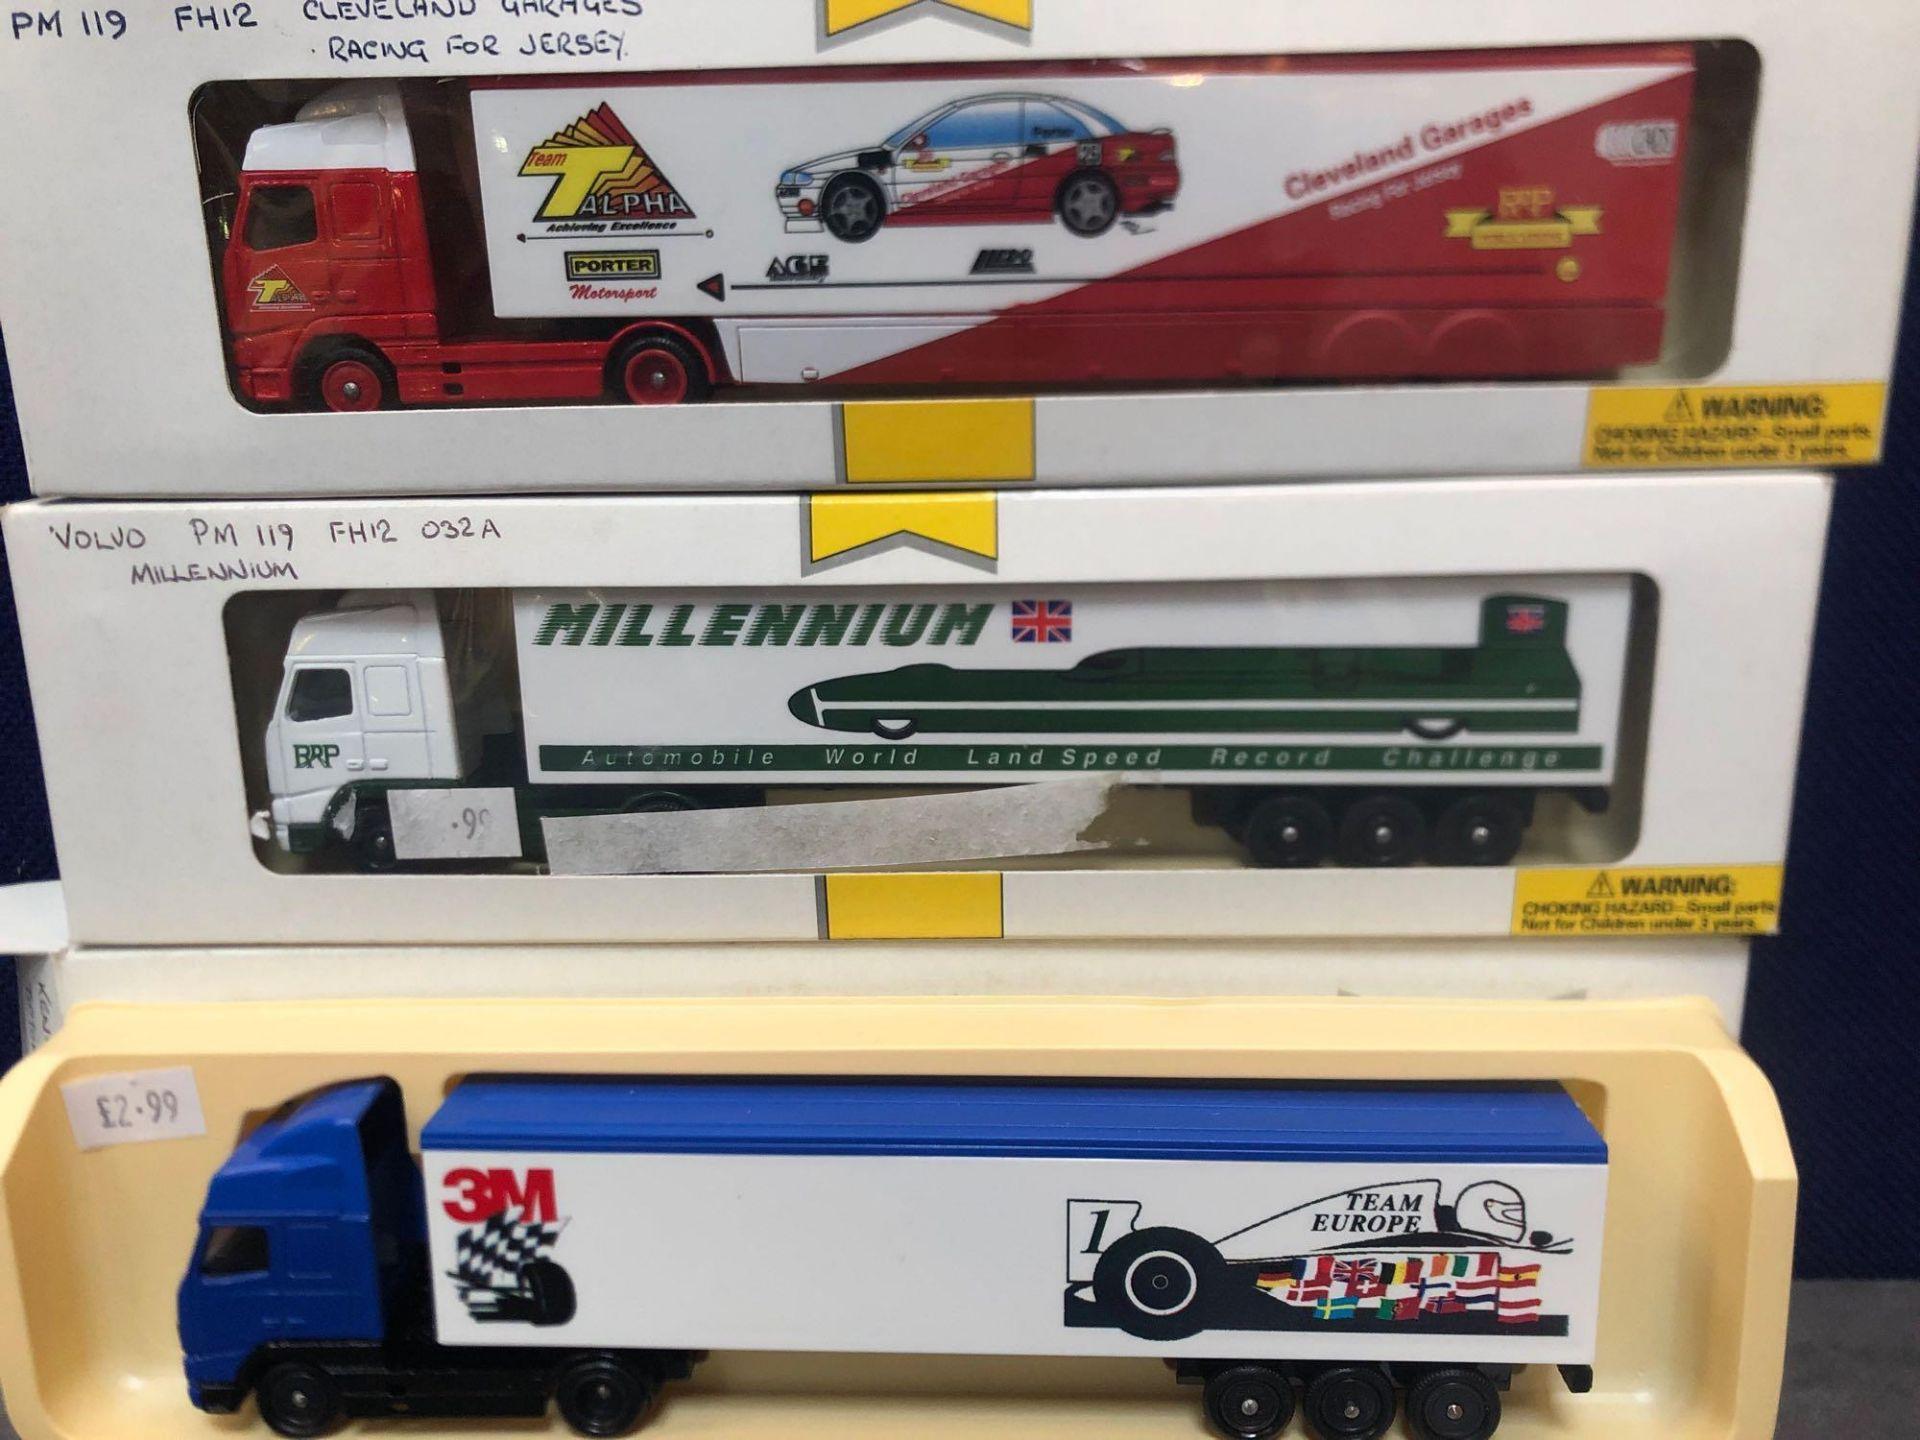 3x Lledo Pro Mover Diecast Trucks Comprising Of; 3M Team Europe, Millennium Automotive World Land - Image 2 of 2